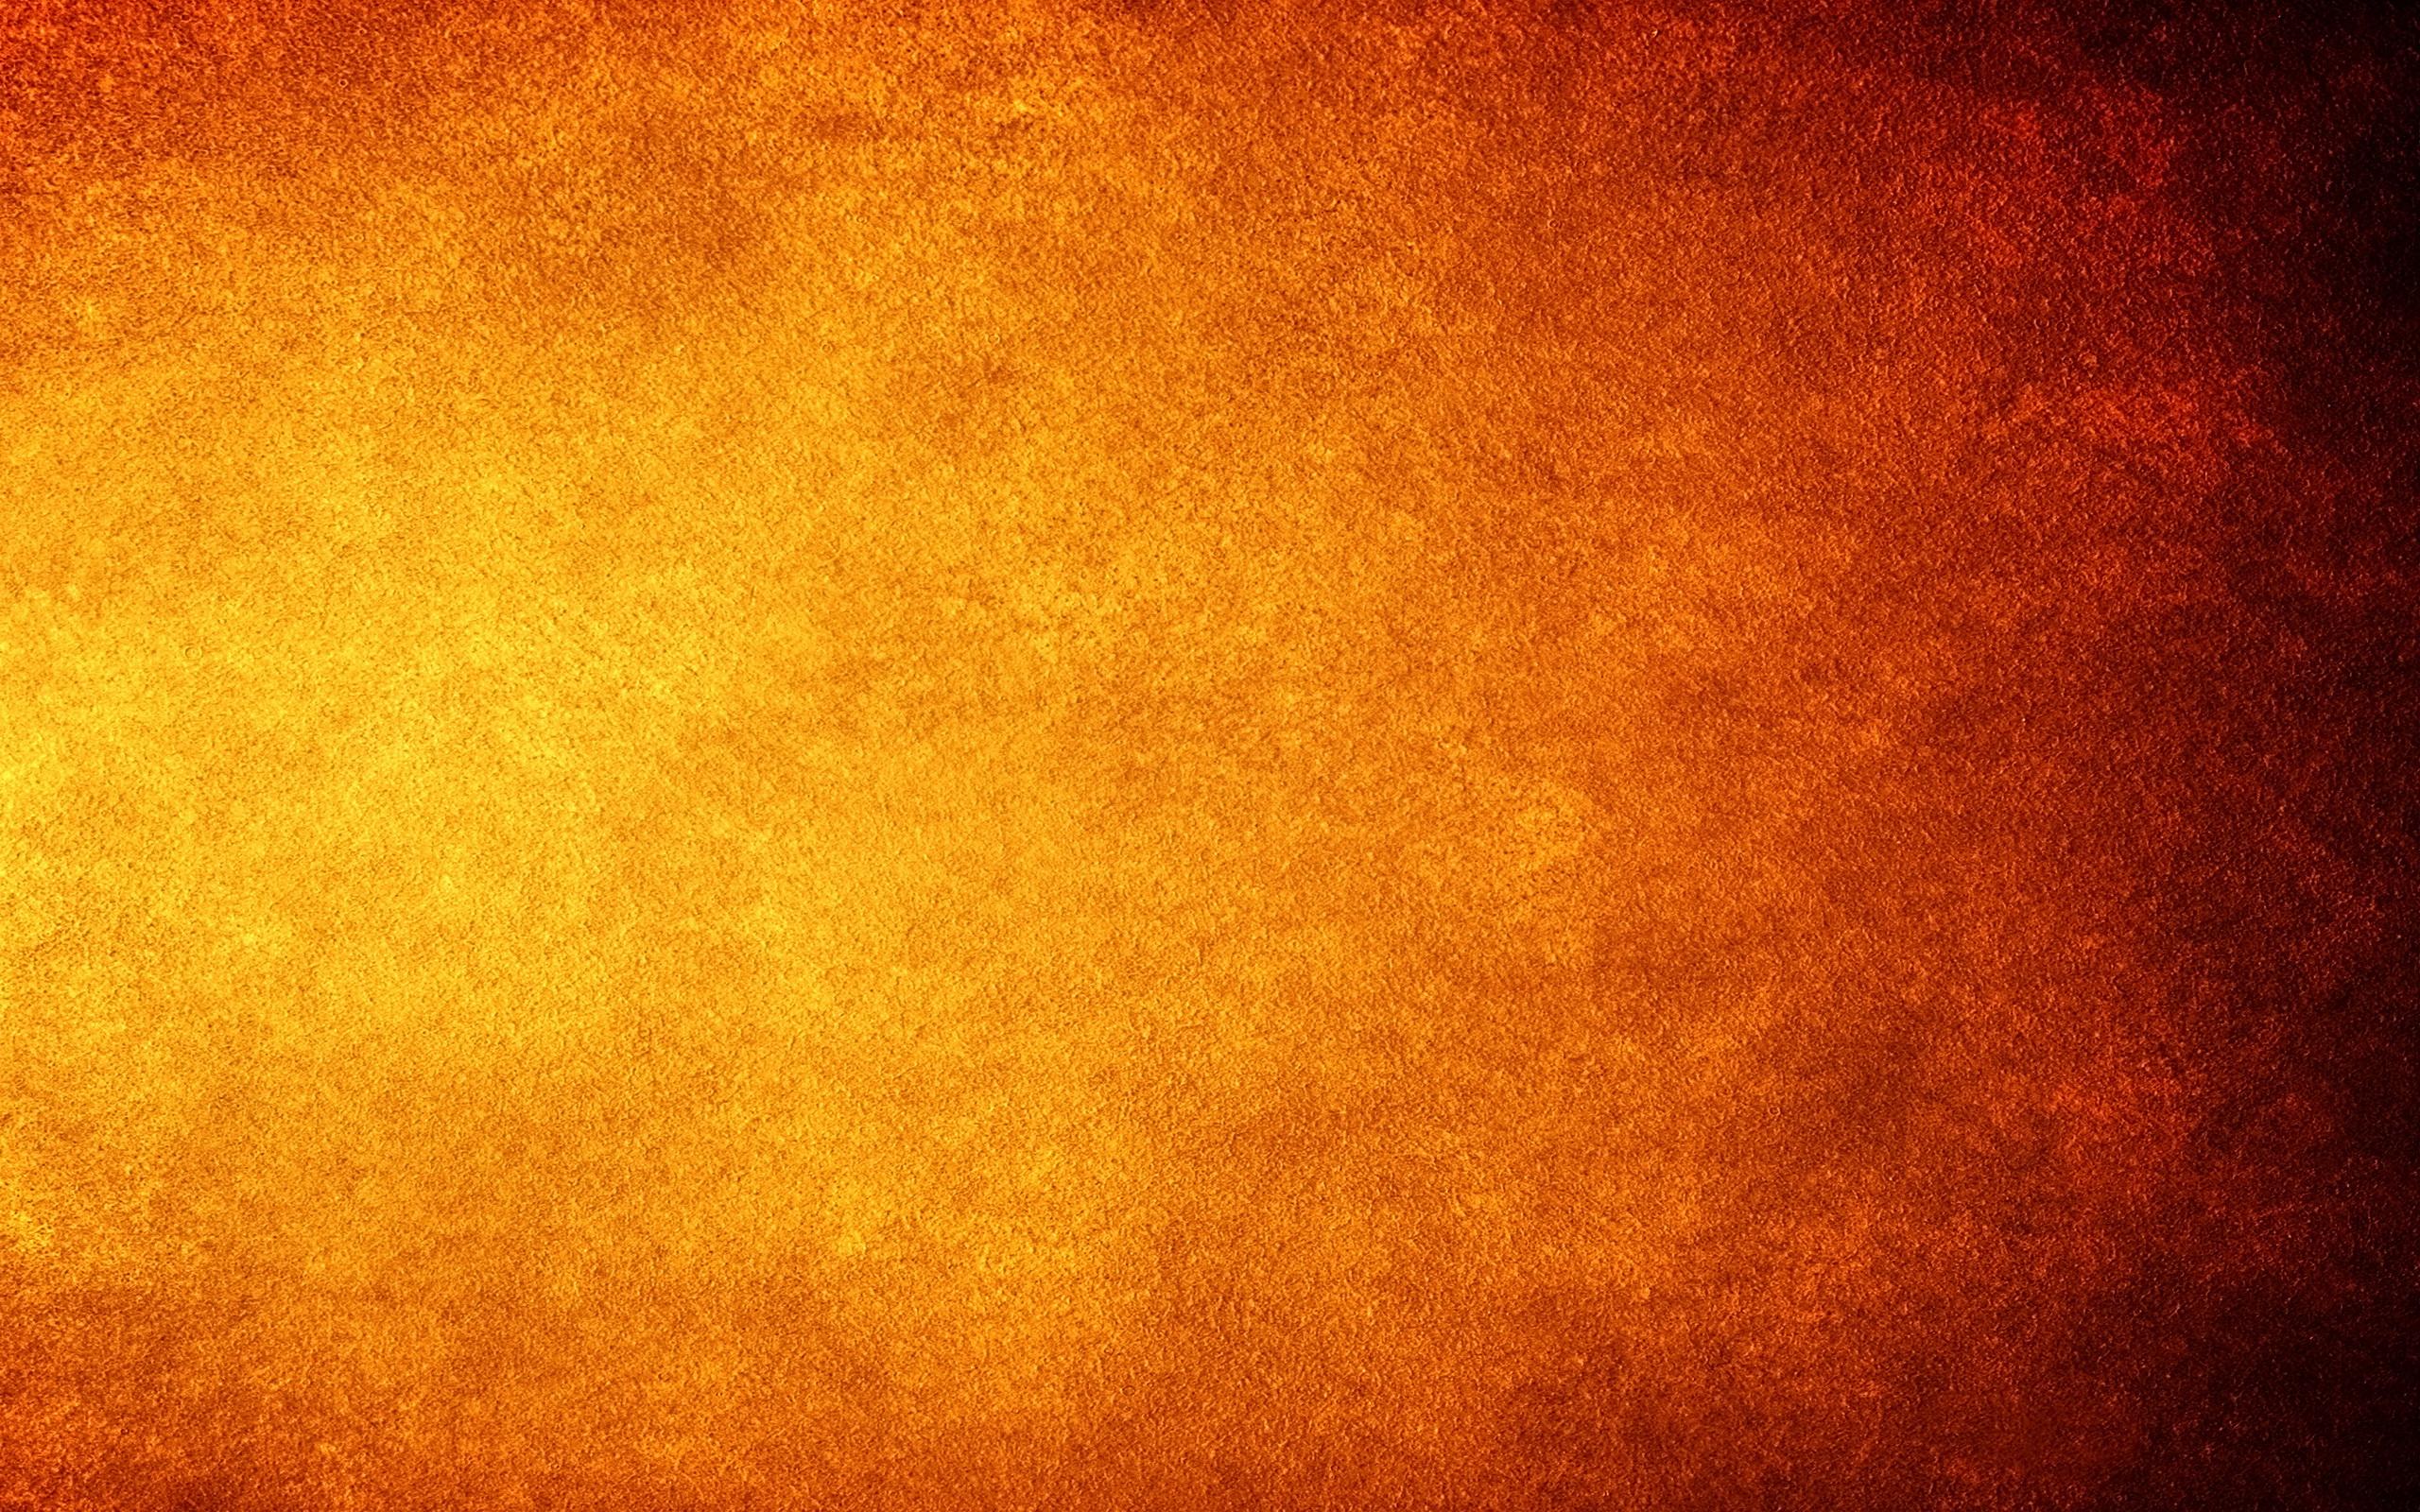 Red Hd Wallpaper >> Orange Wallpaper Background - WallpaperSafari